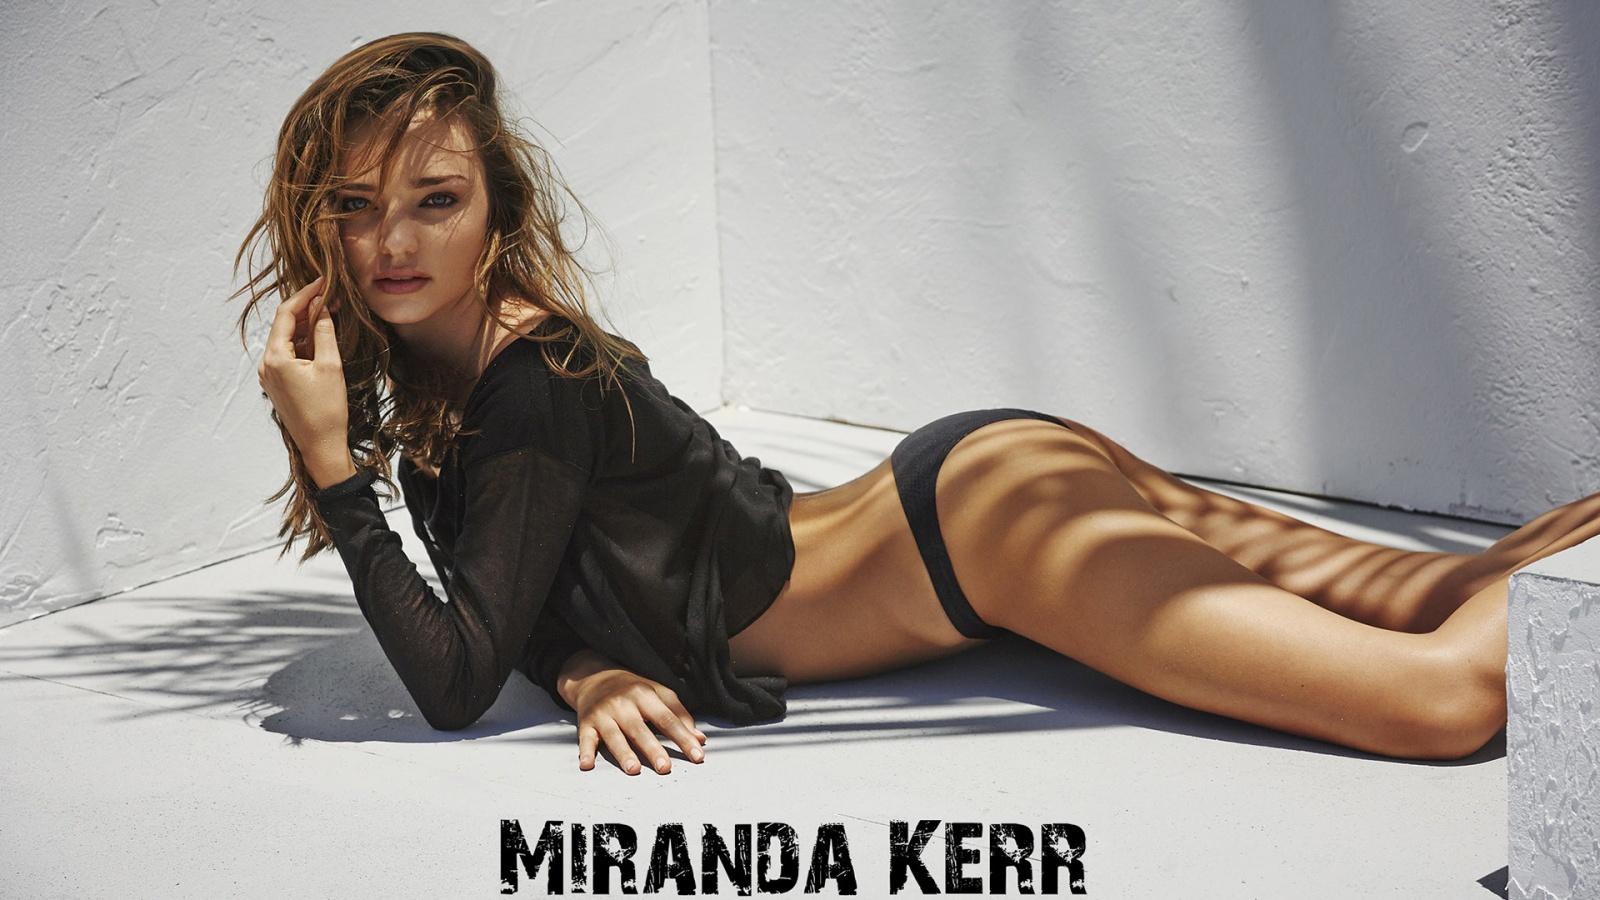 Miranda Kerr in hot bikini covering her tiny ass glamour photo hd wallpaper 1600x900 nude models ...